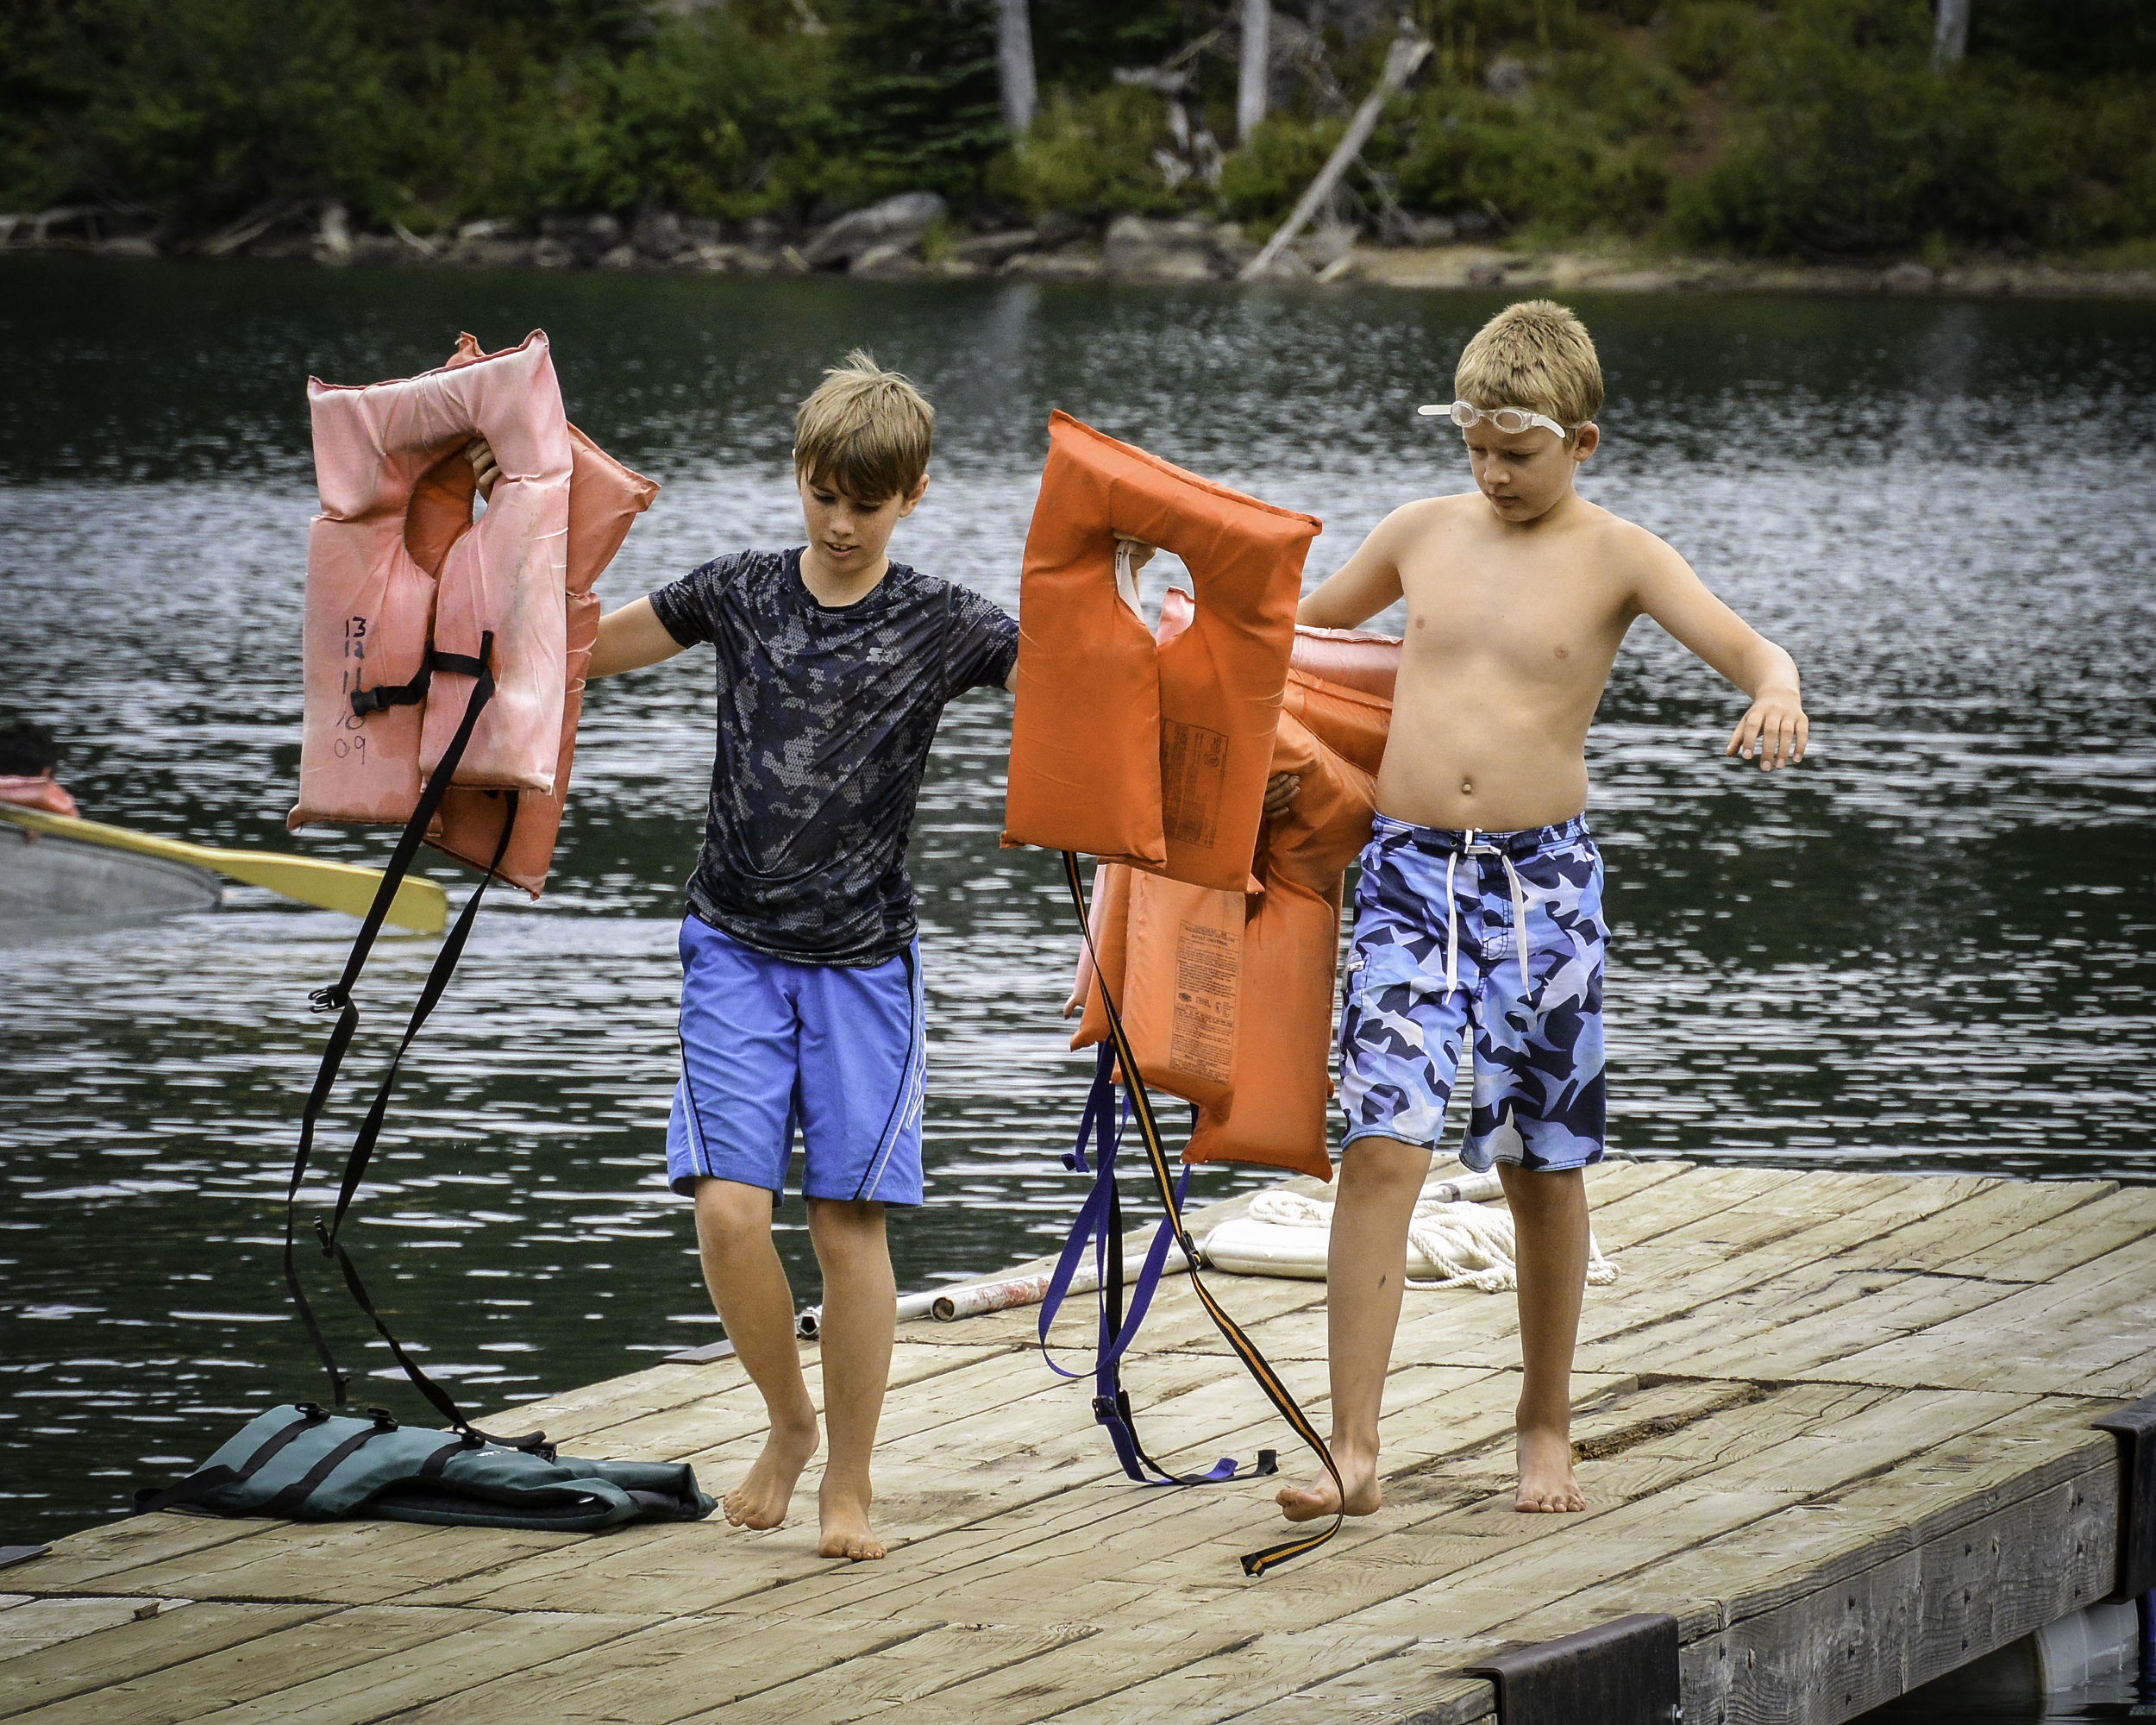 Life jackets 2.jpg